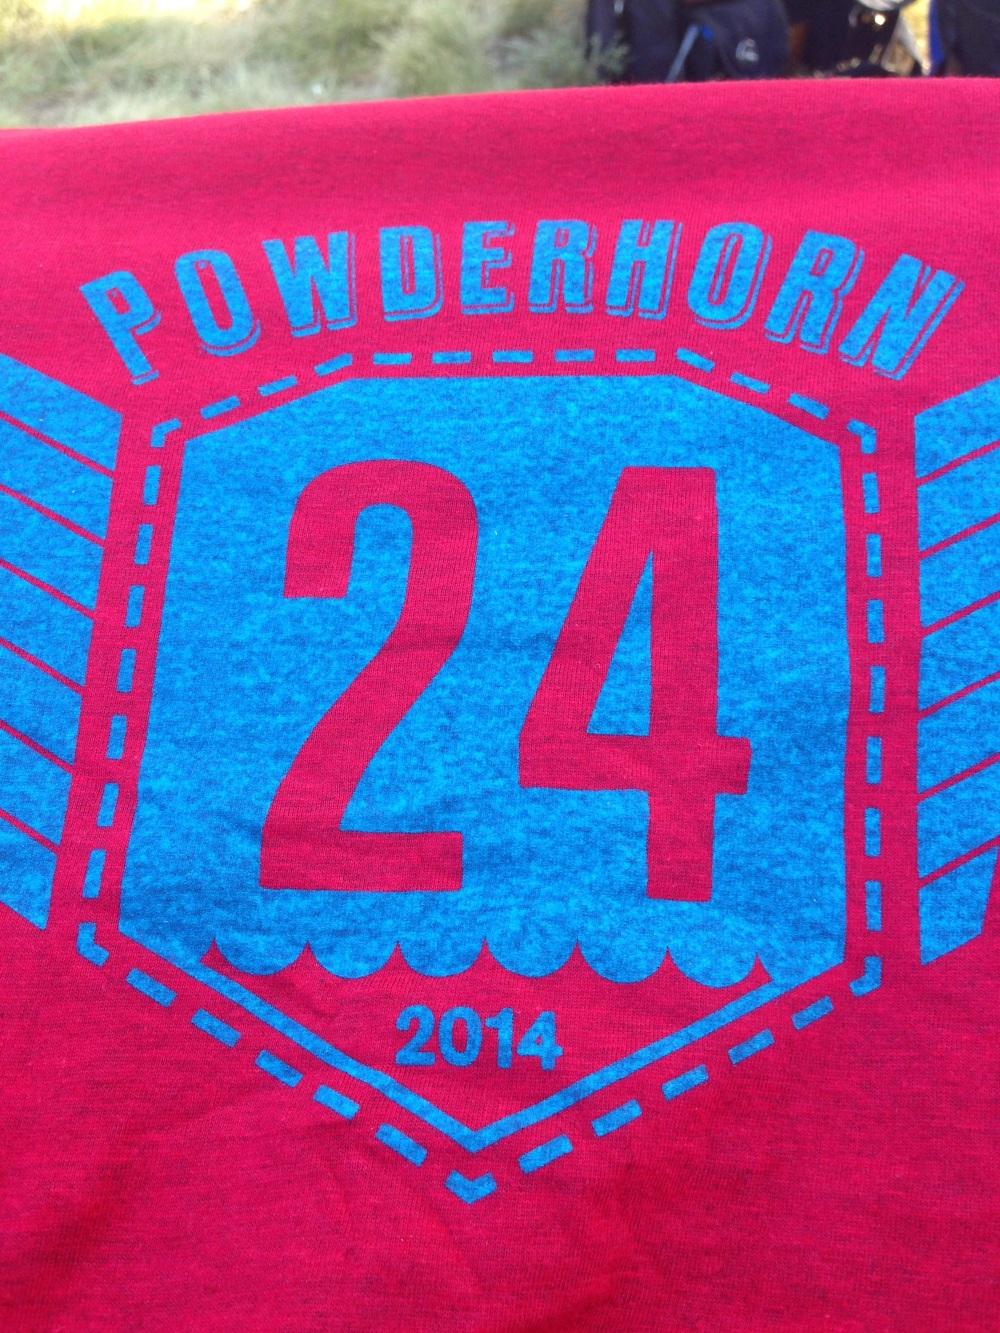 The 2014 rider t-shirt.